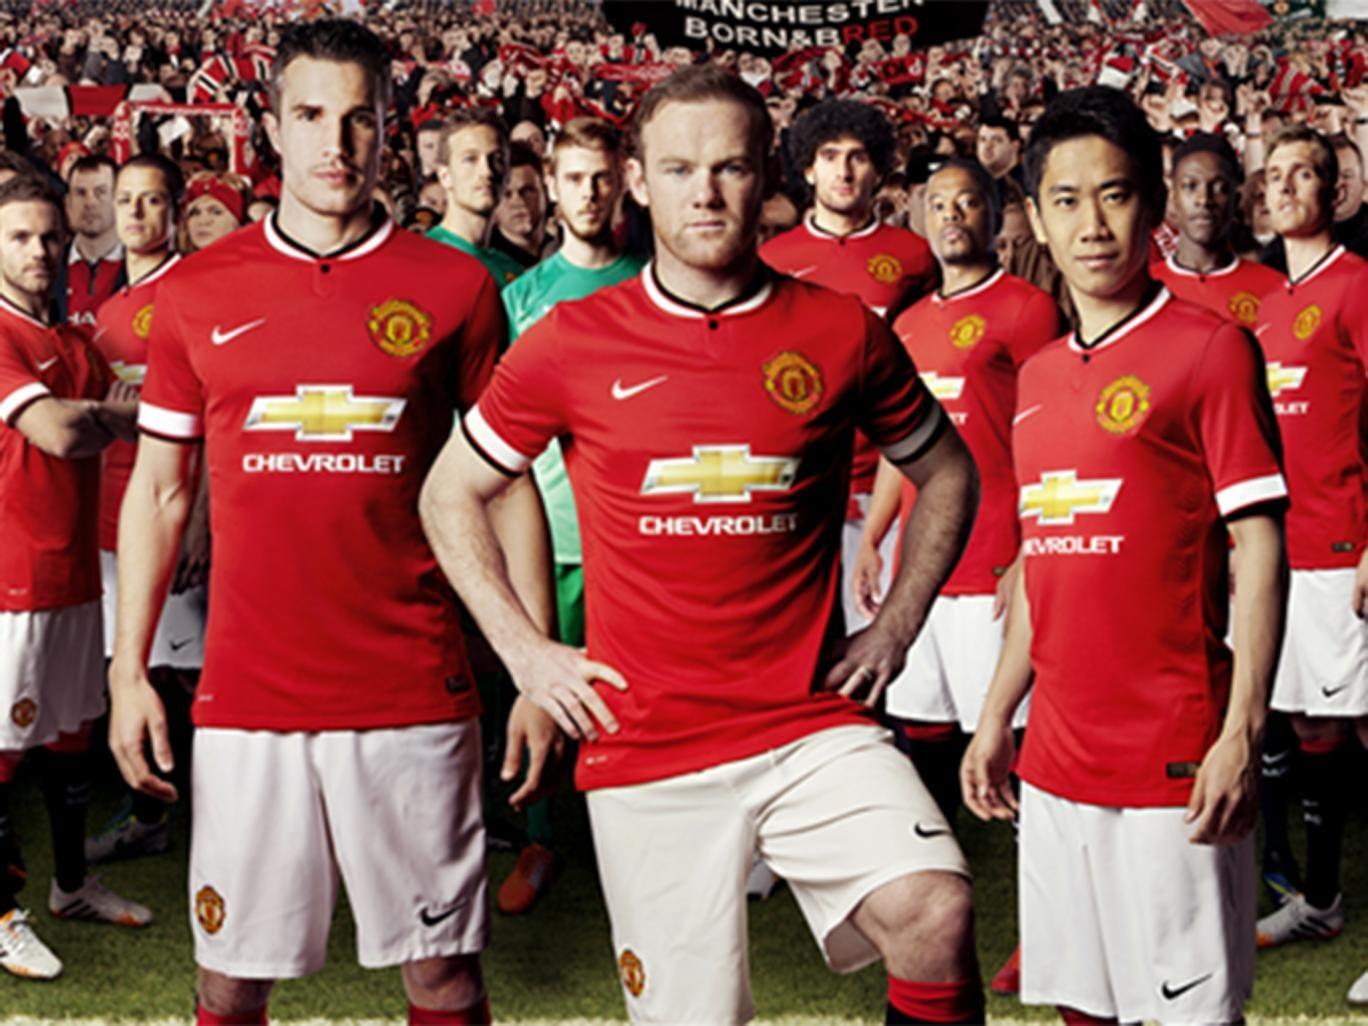 Manchester United's kit for the 2014/15 season